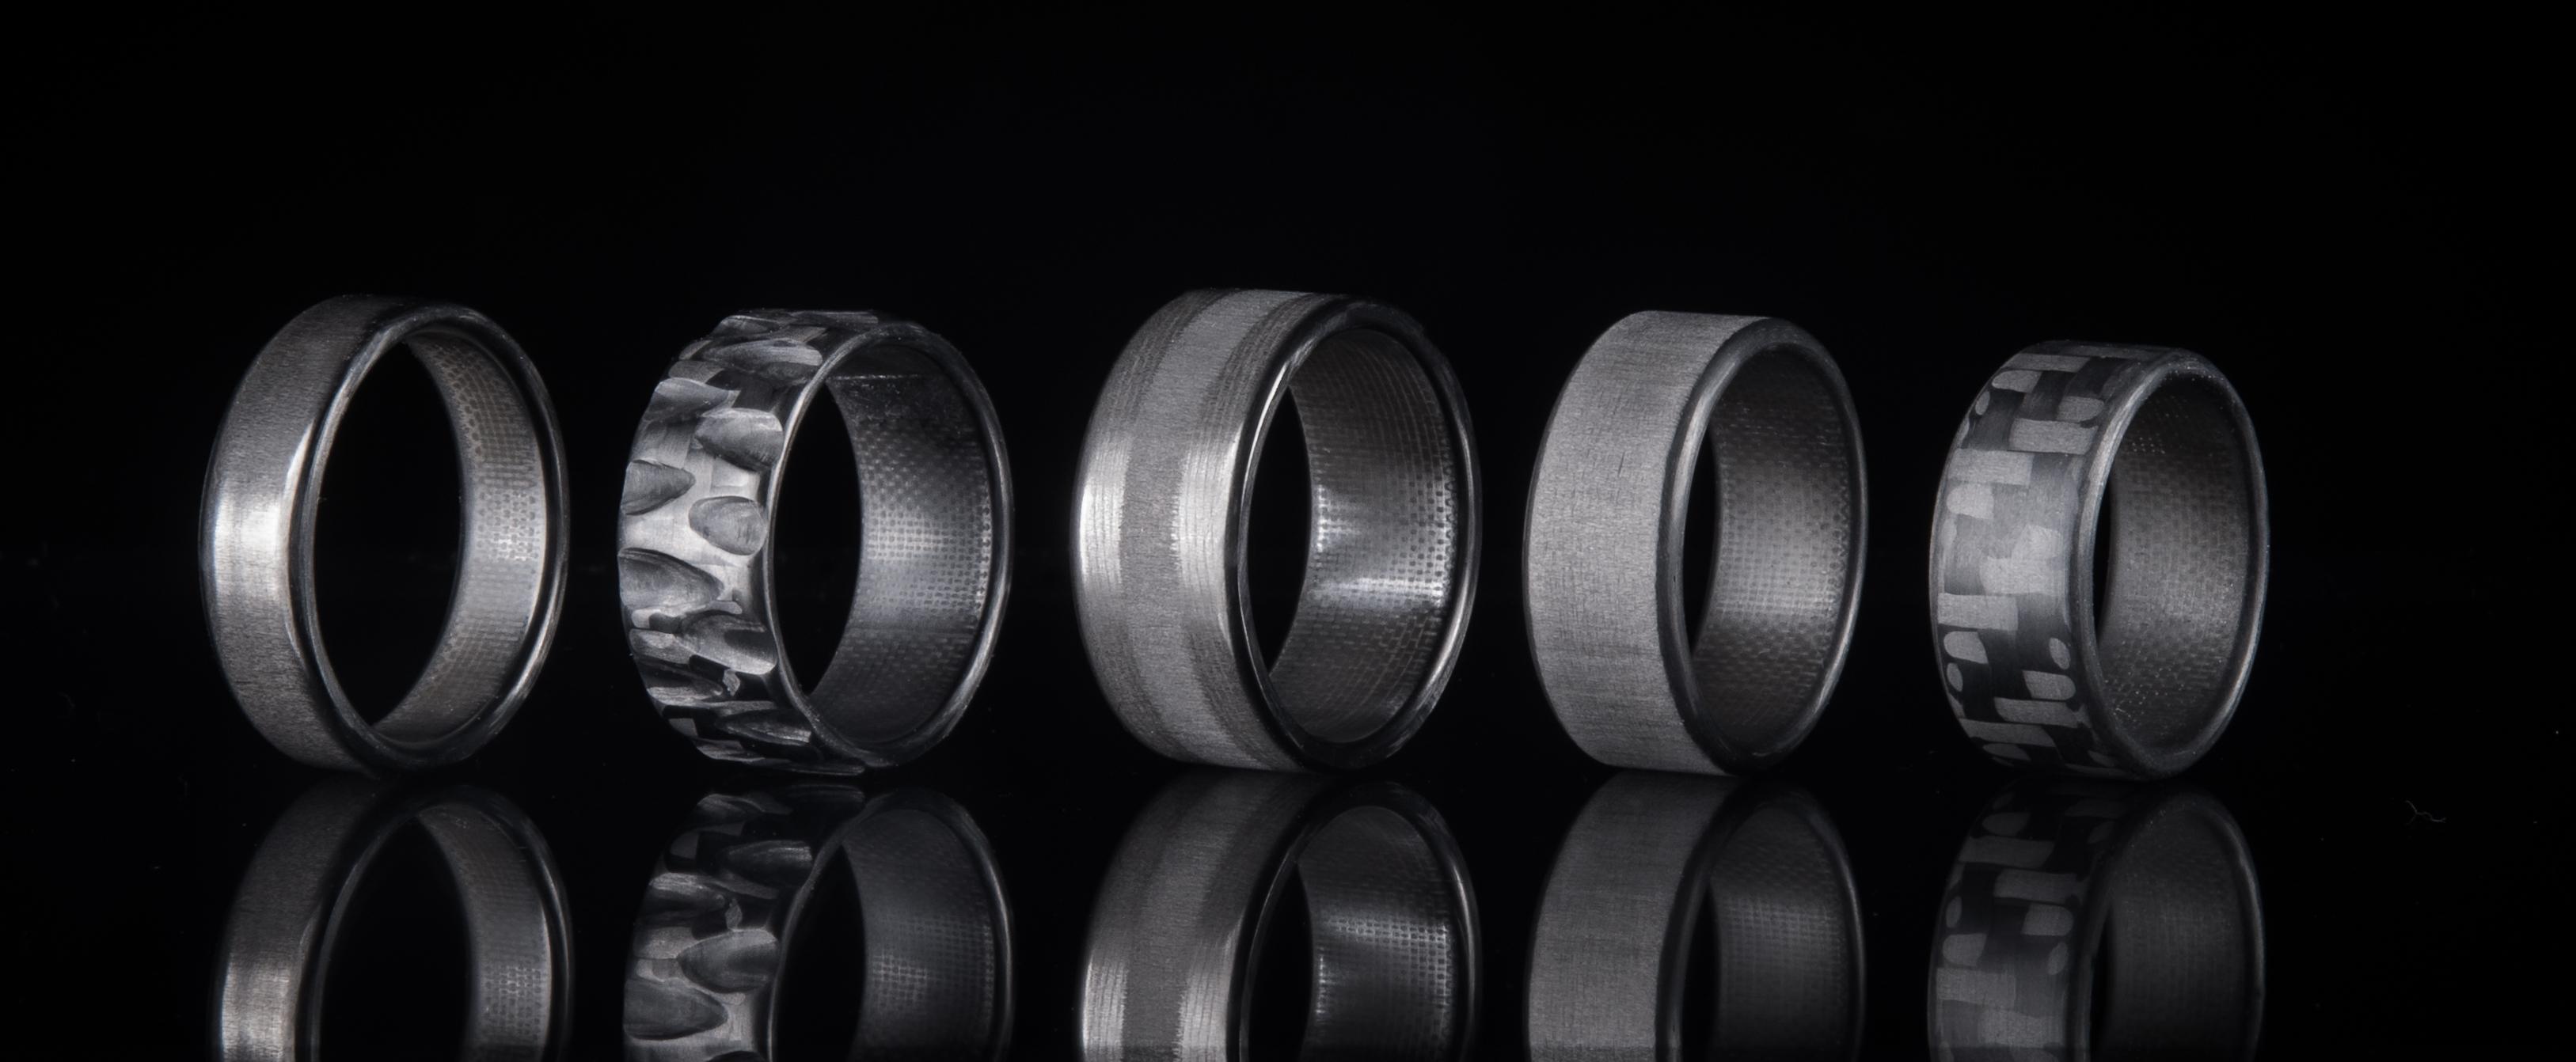 carbon fiber rings carbon fiber wedding bands Carbon Fiber Rings